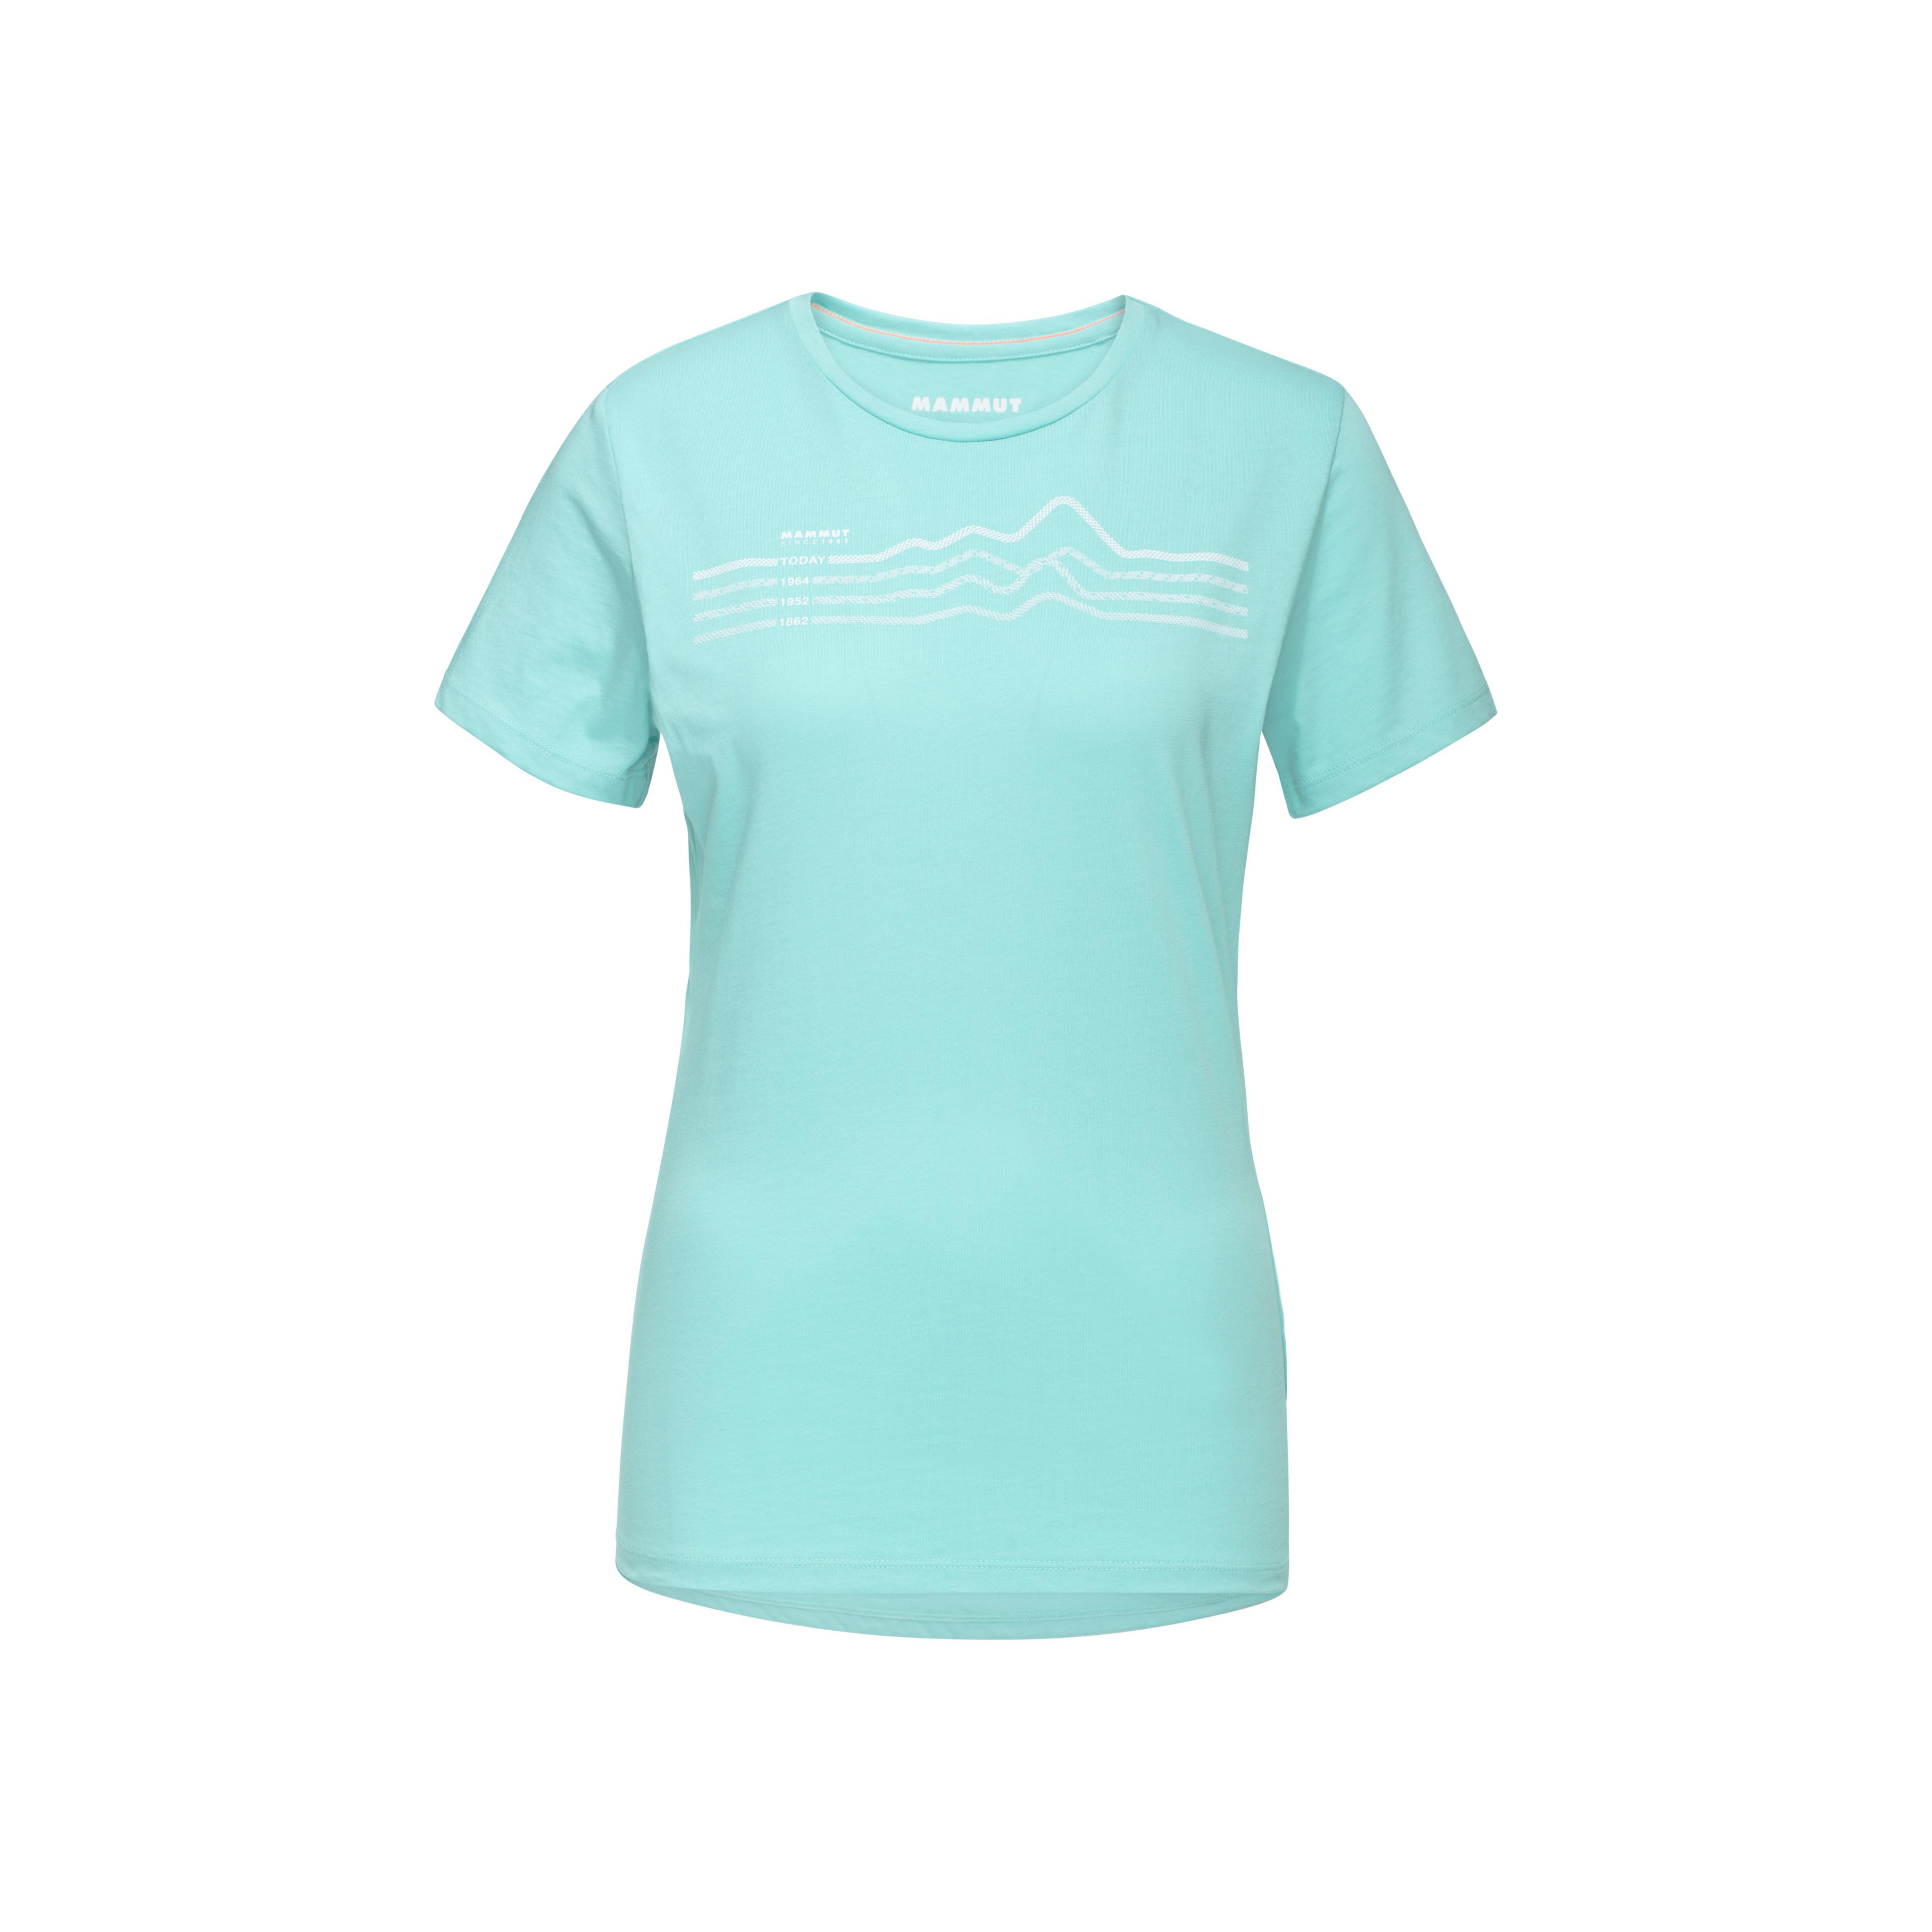 Seile T-Shirt Women - dark frosty PRT3, XS thumbnail